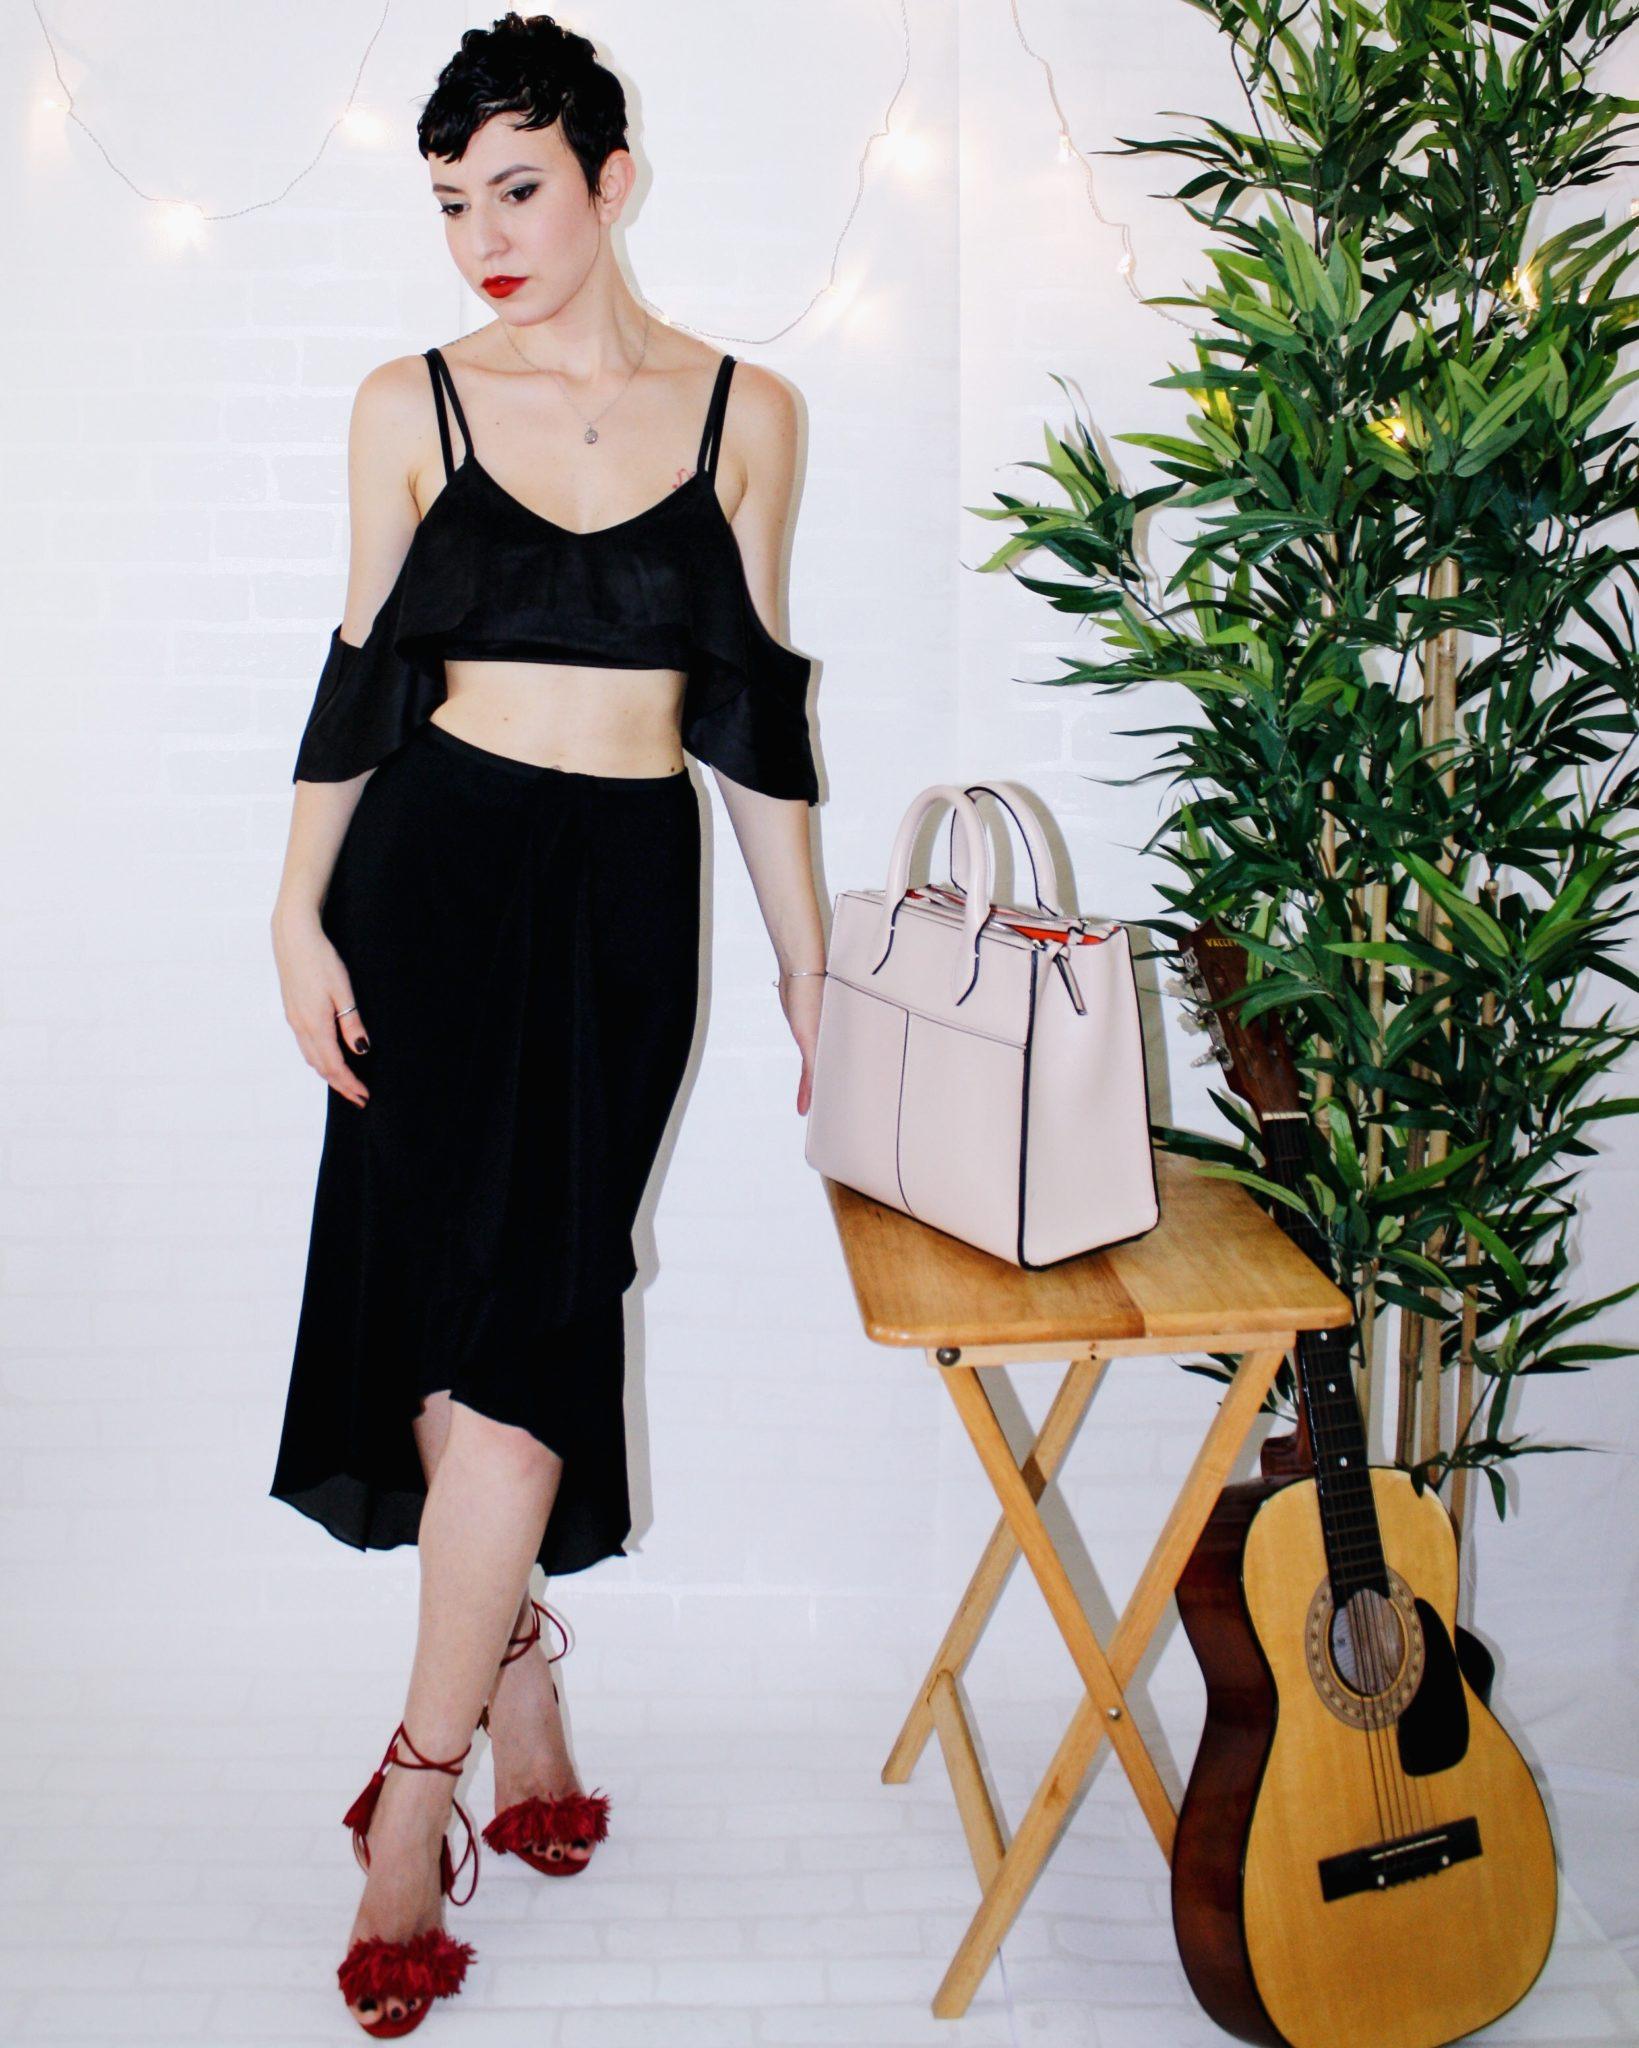 spanish revival bardot top missguided dvf skirt aquazzura shoe guitar zara bag